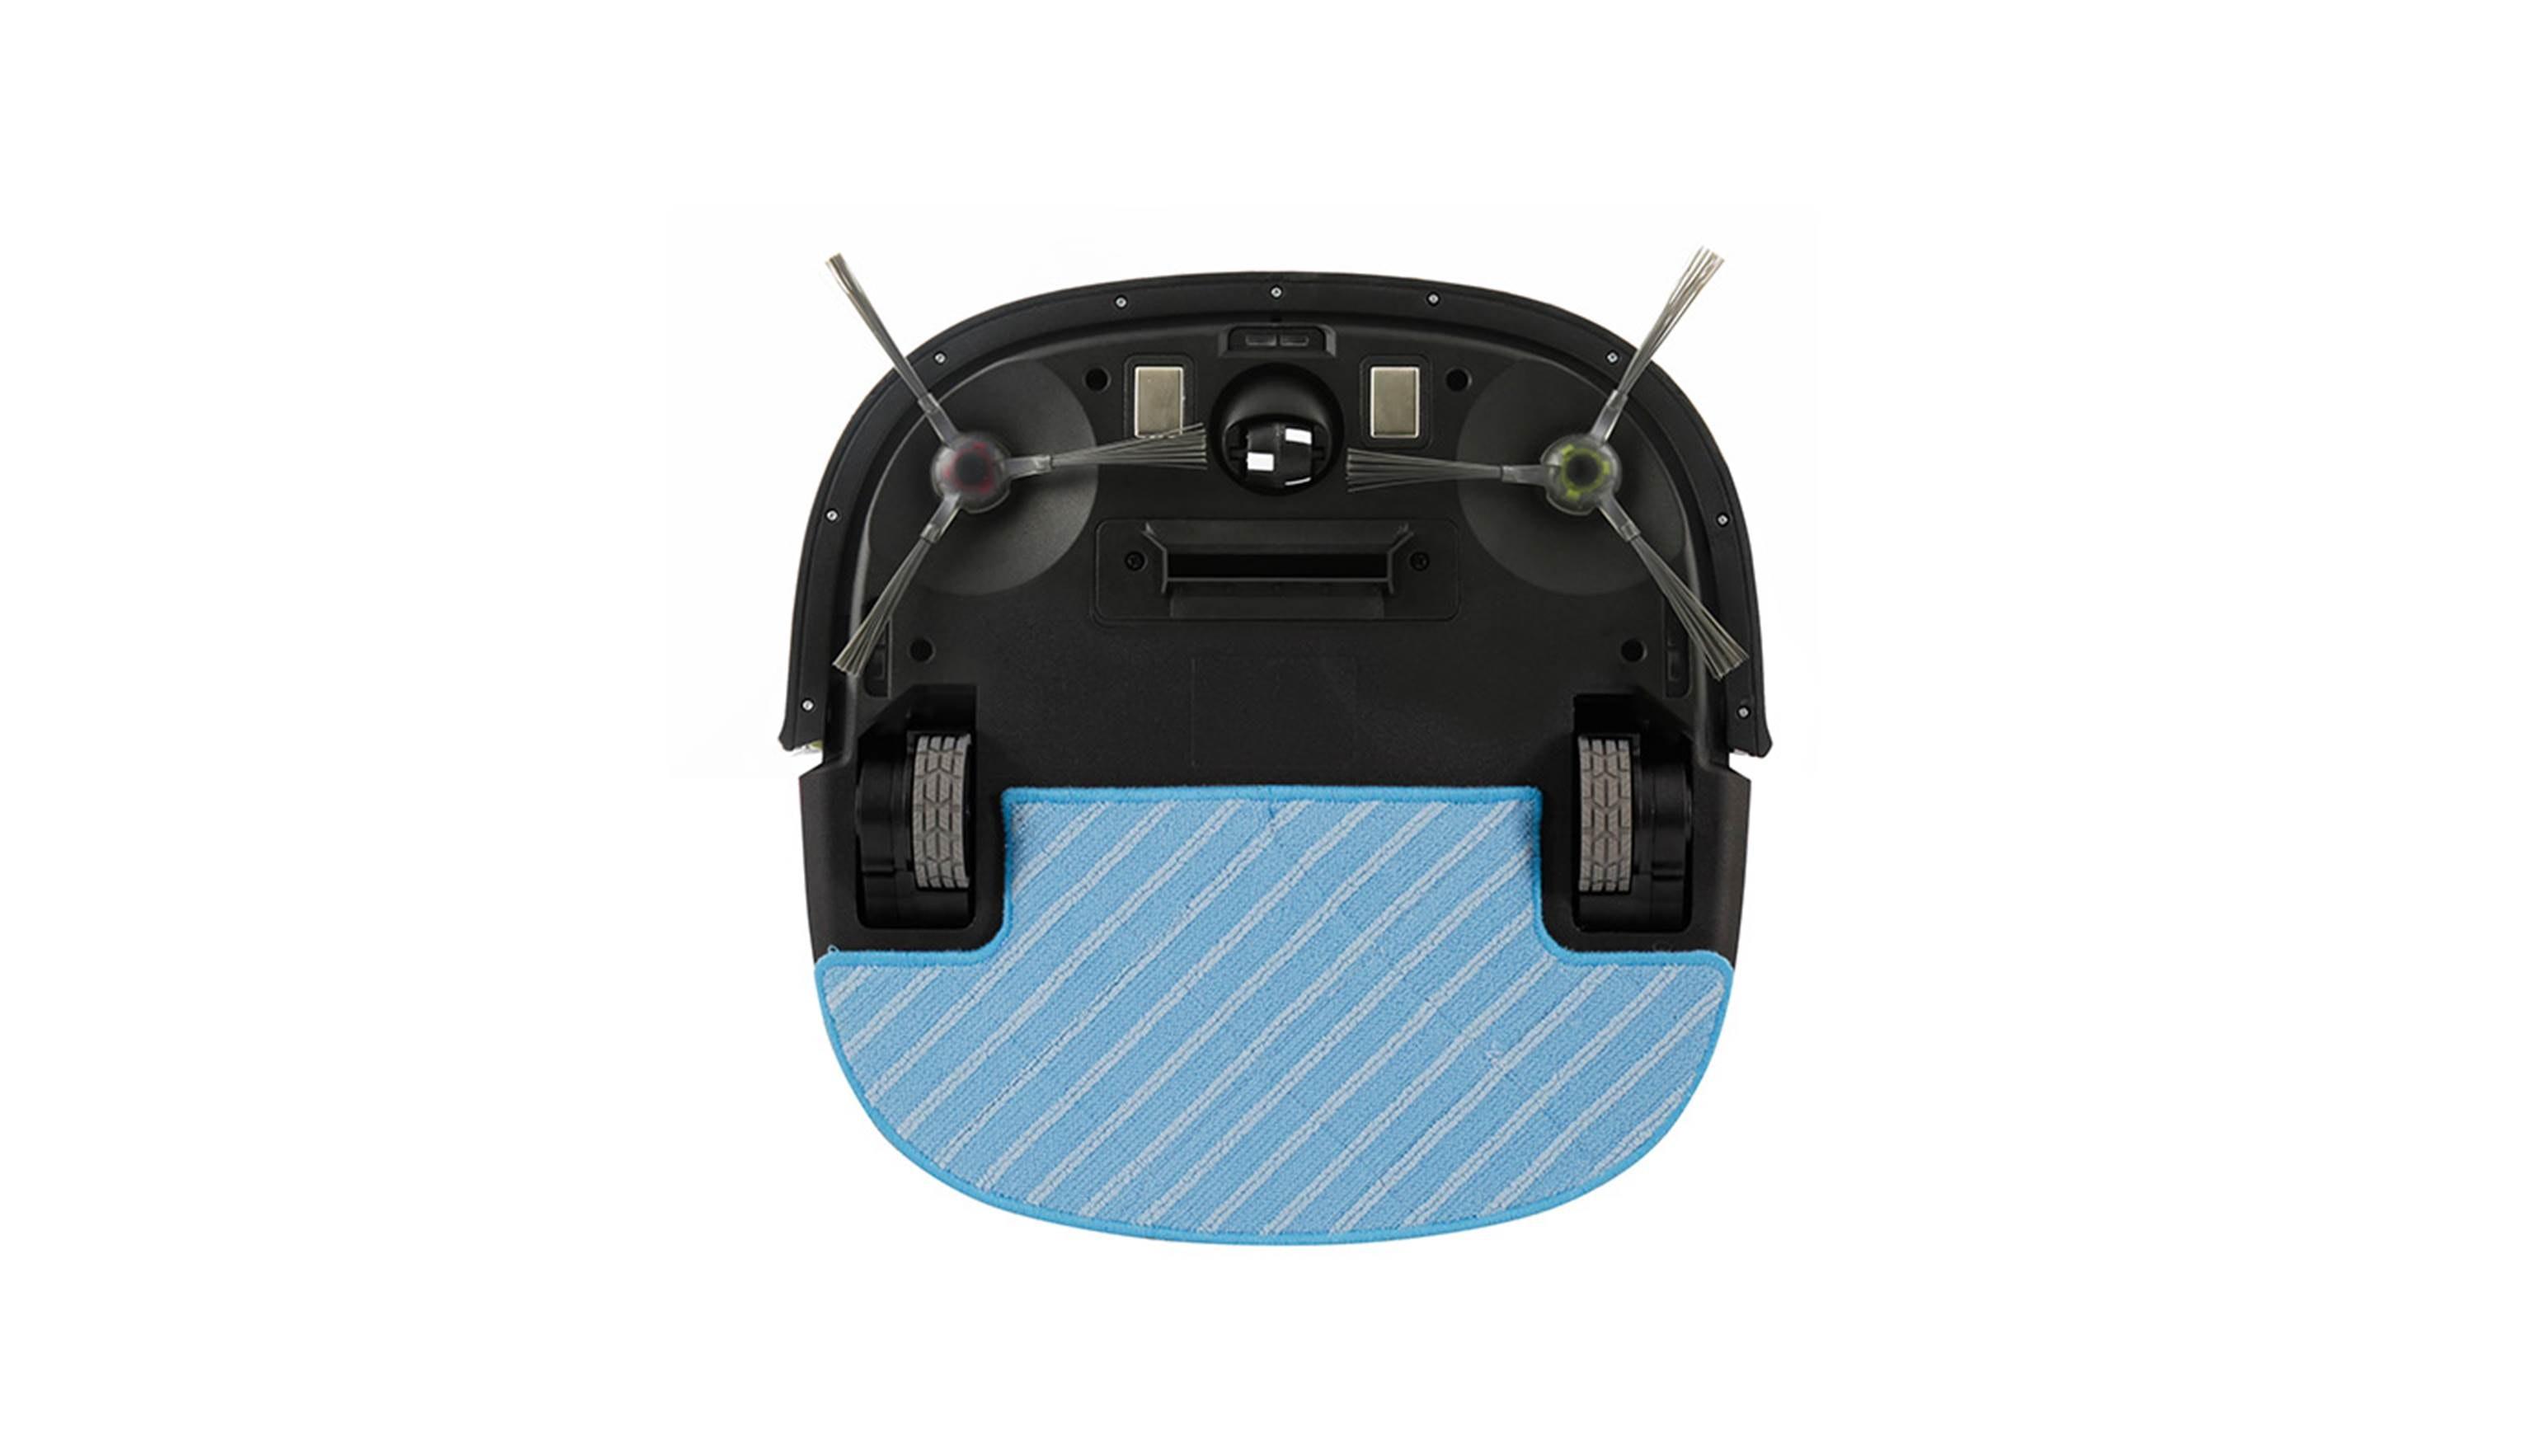 Ecovas Deebot Slim Robotic Vacuum - Bottom View